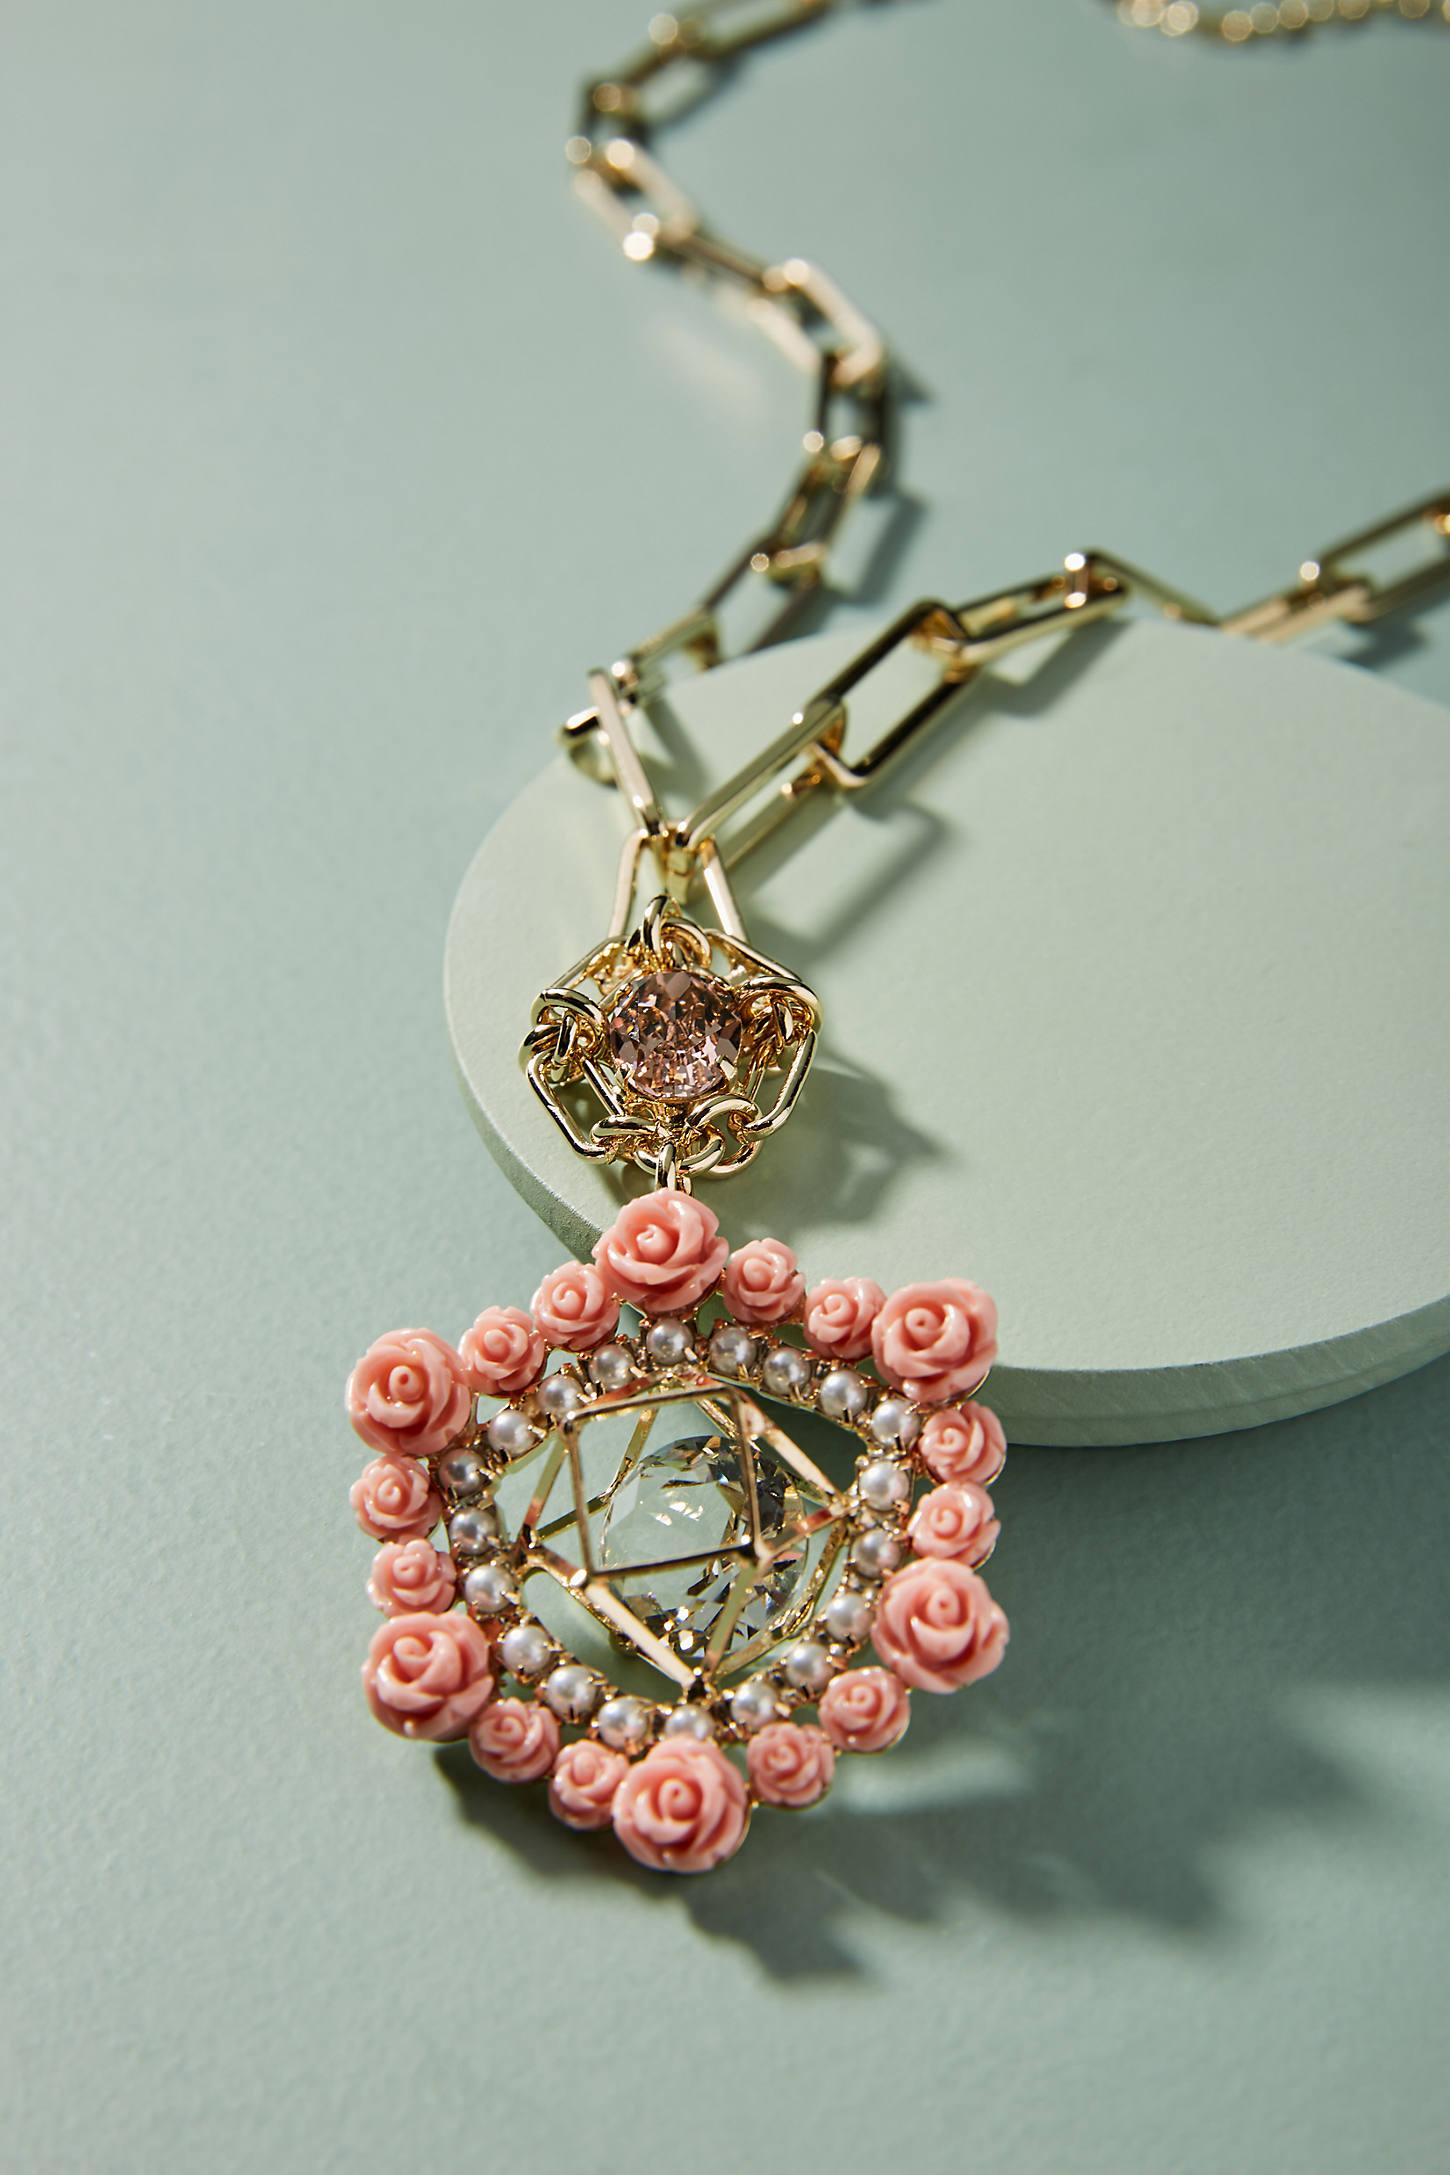 Harte Drop Necklace